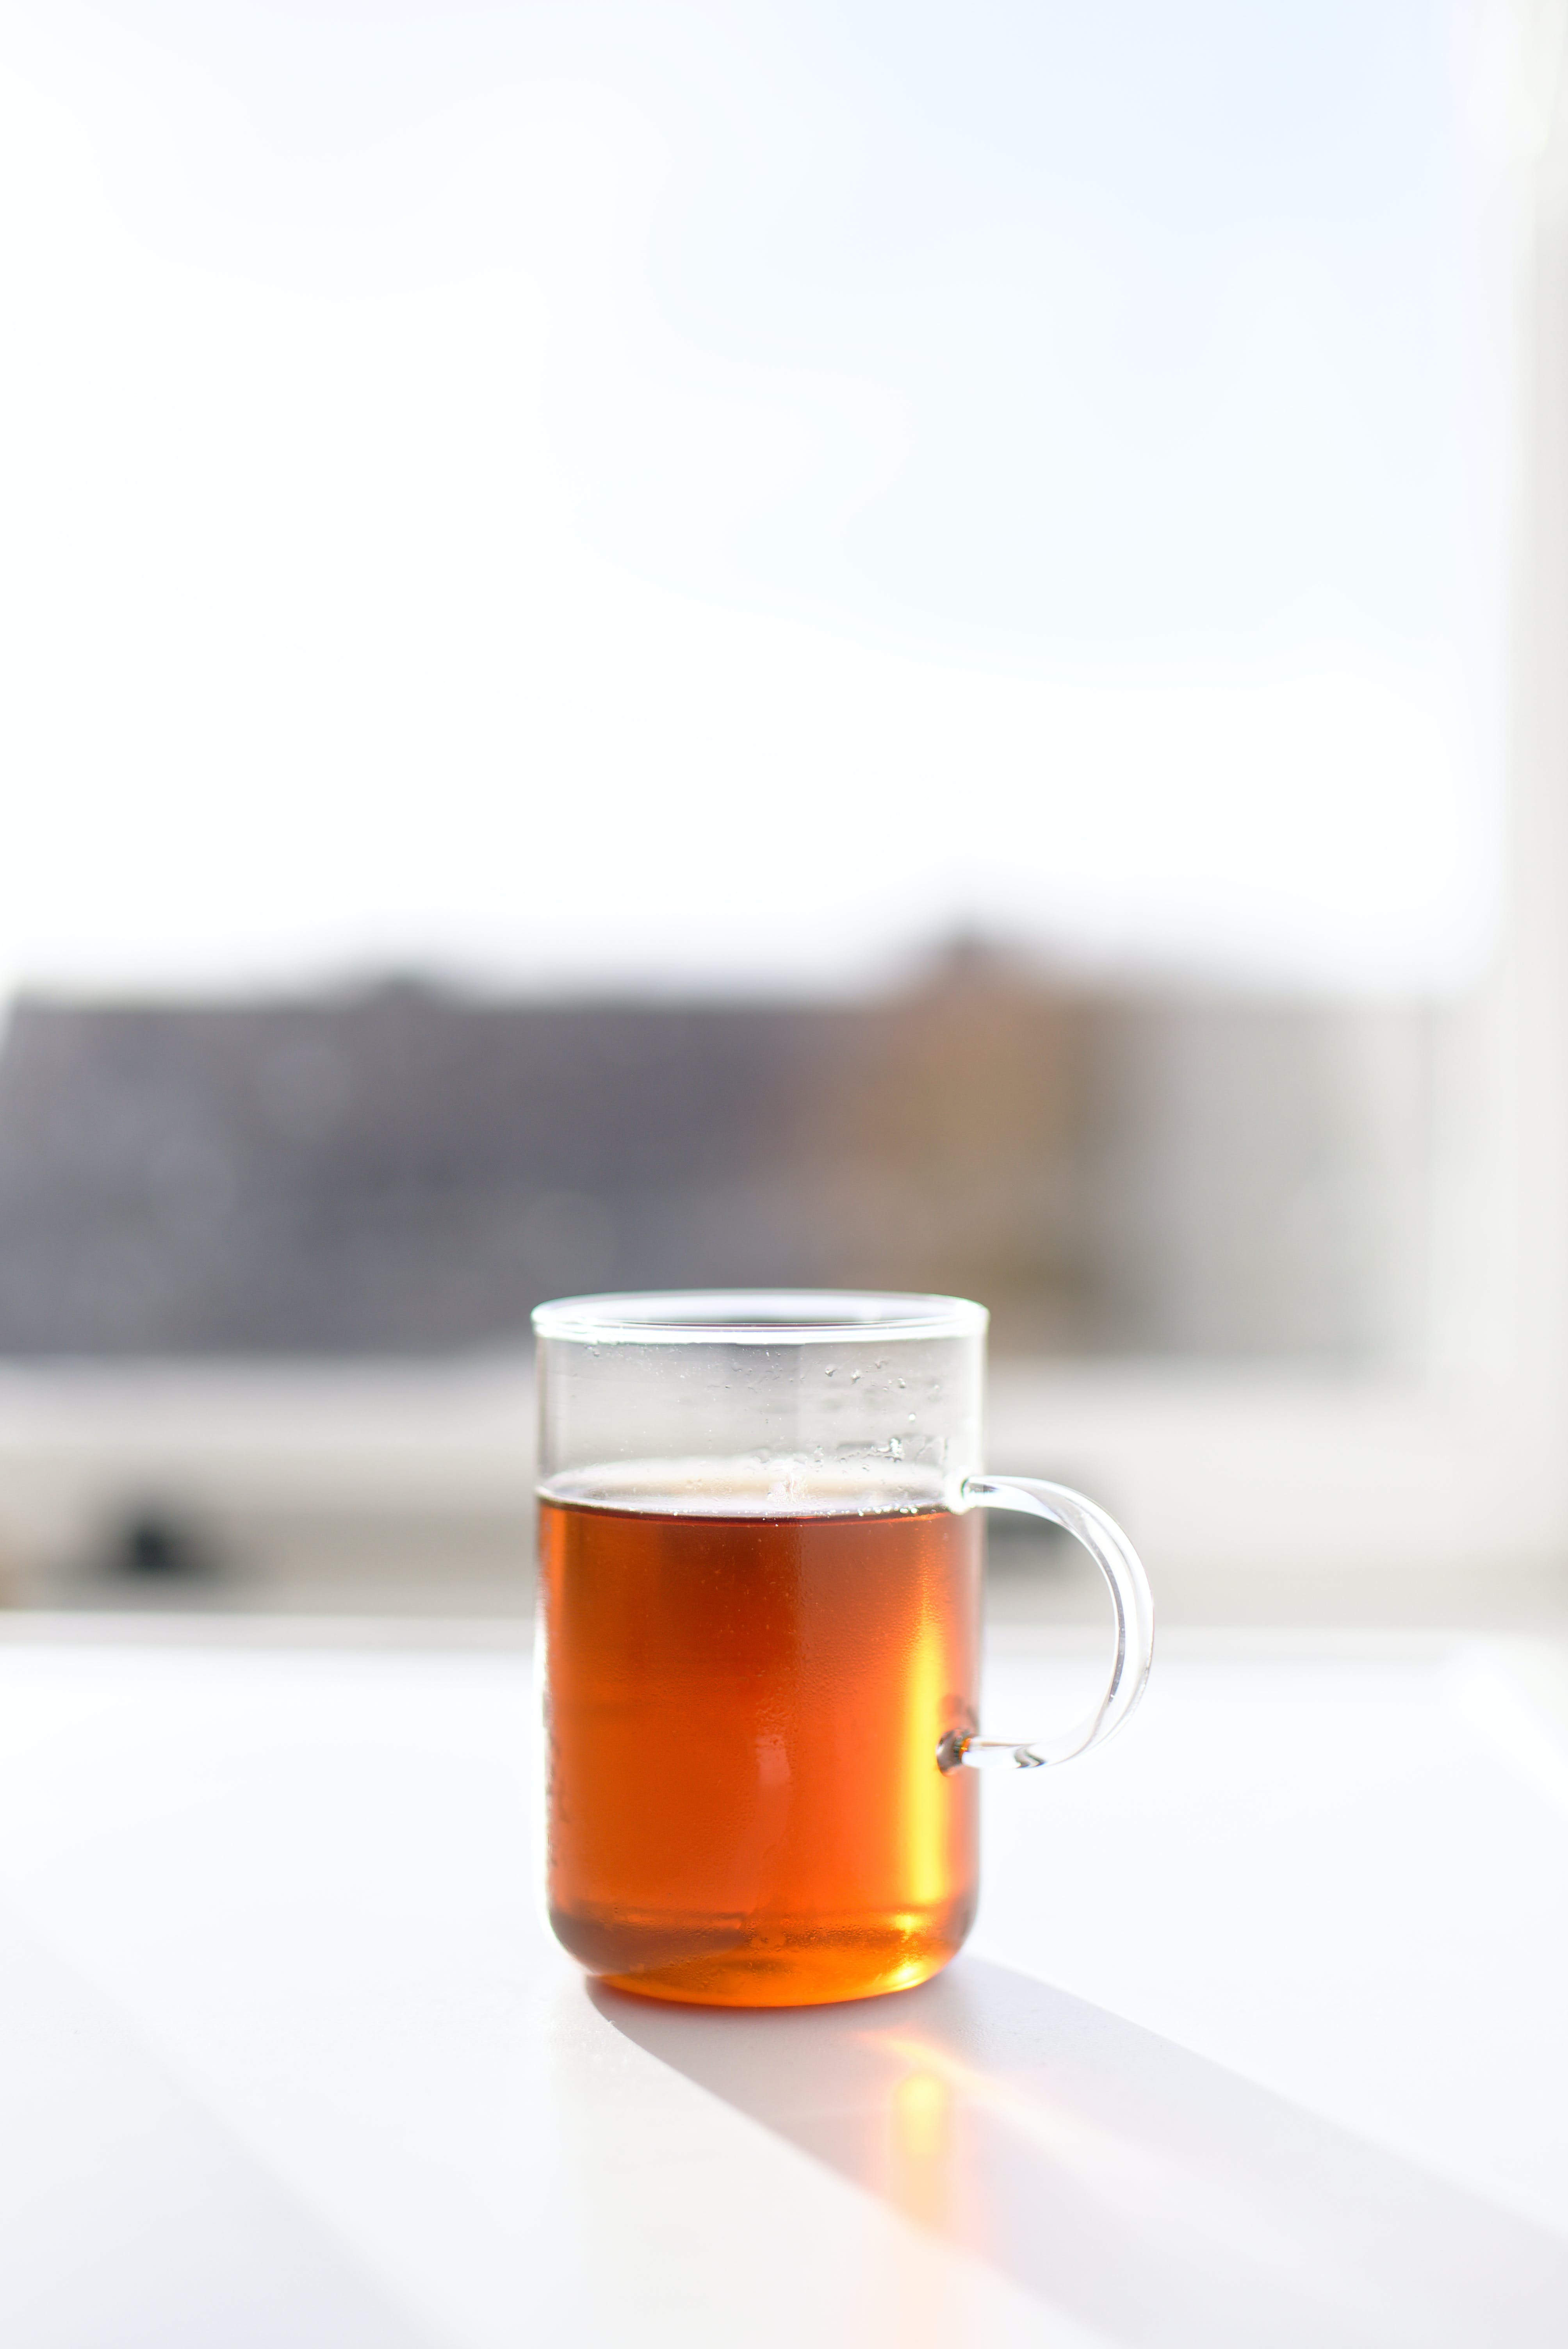 Free stock photo of cup, drink, minimal, mug